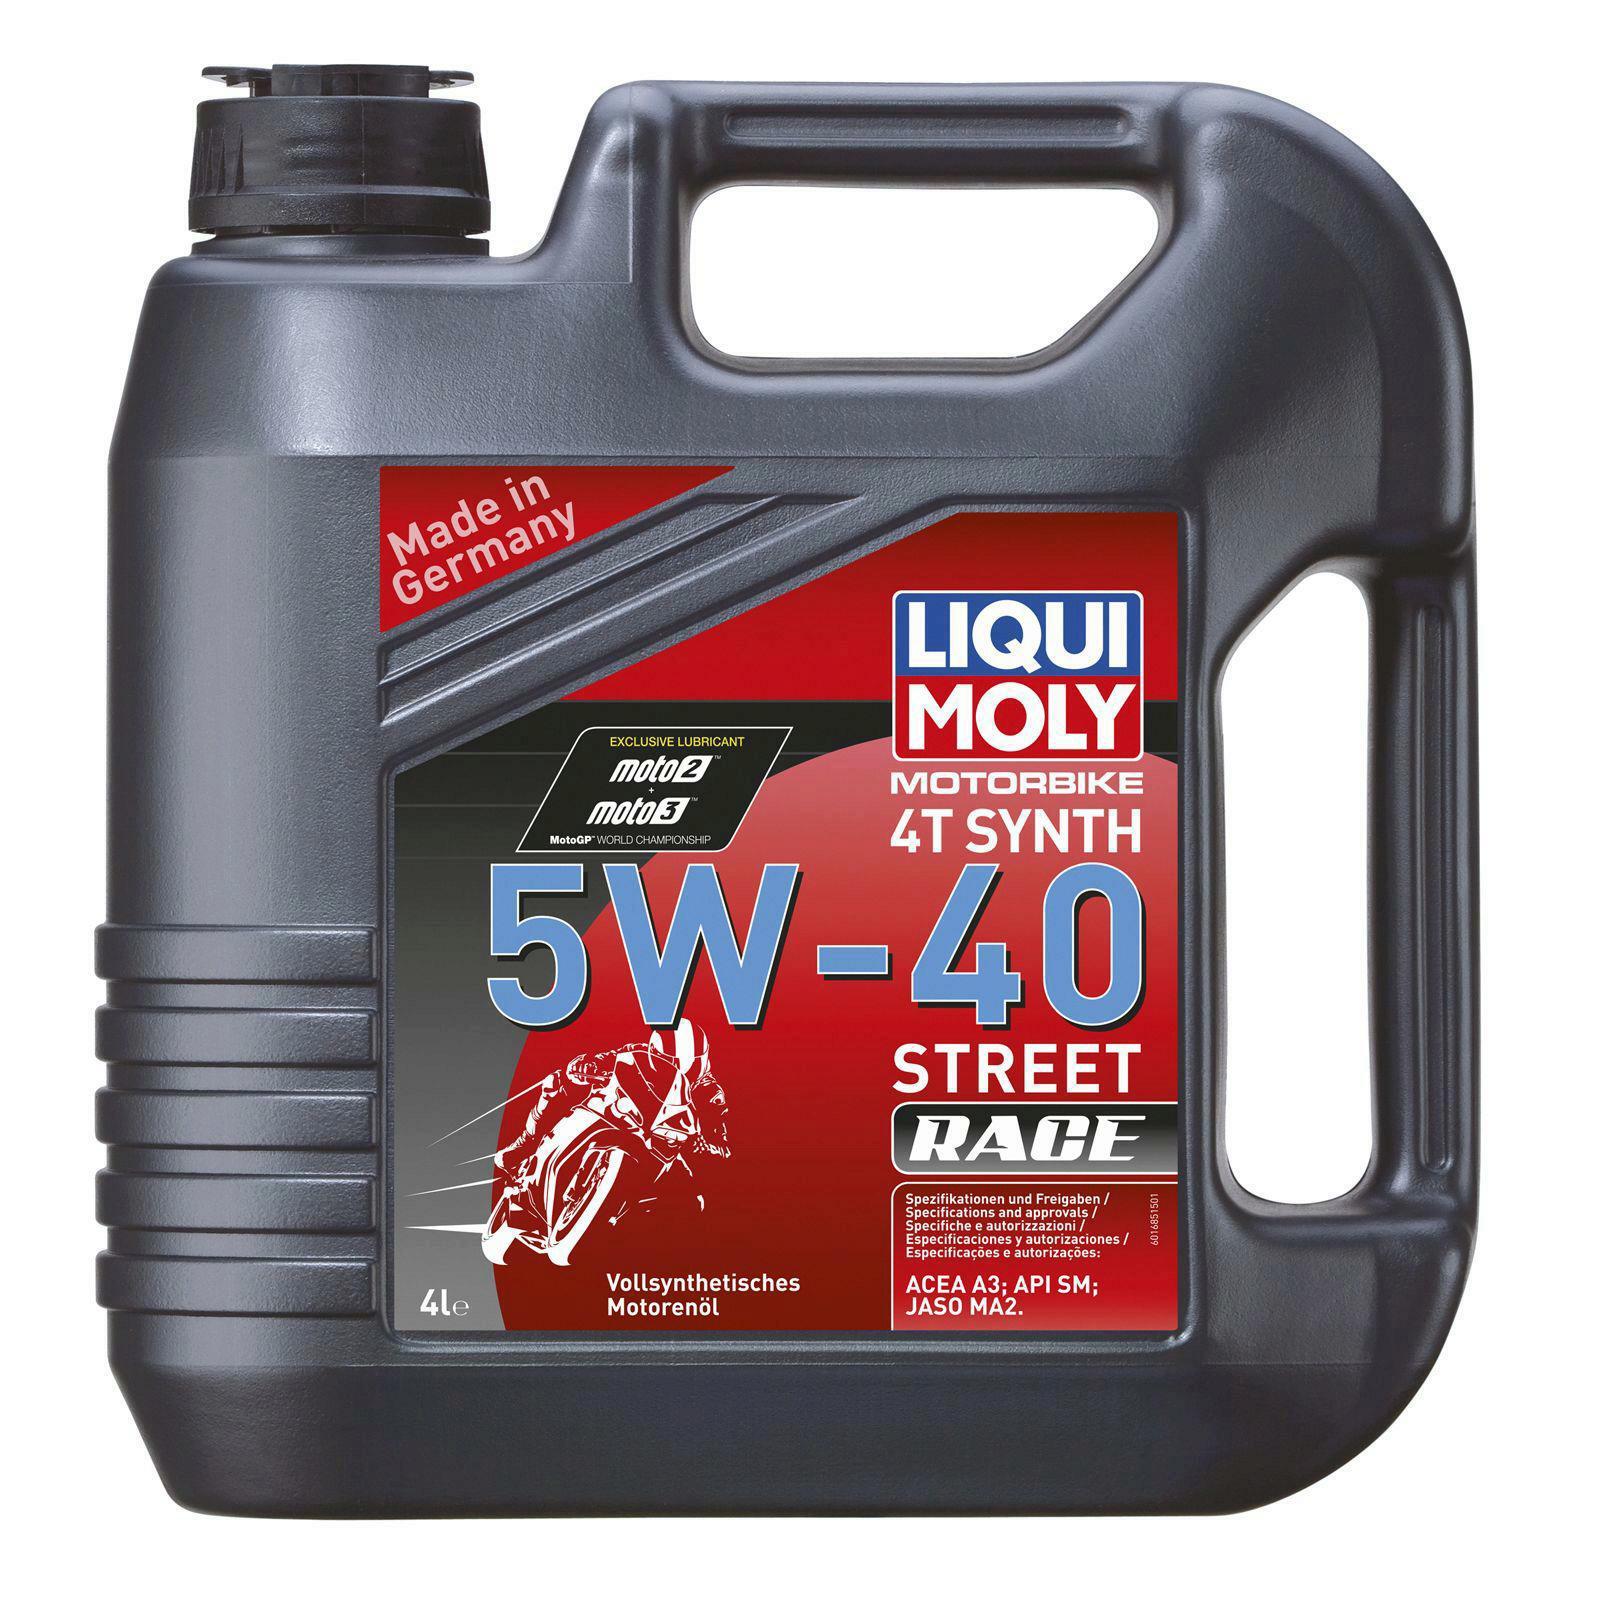 Liqui Moly Motorbike 4T Synth 5W-40 Street Race 4l